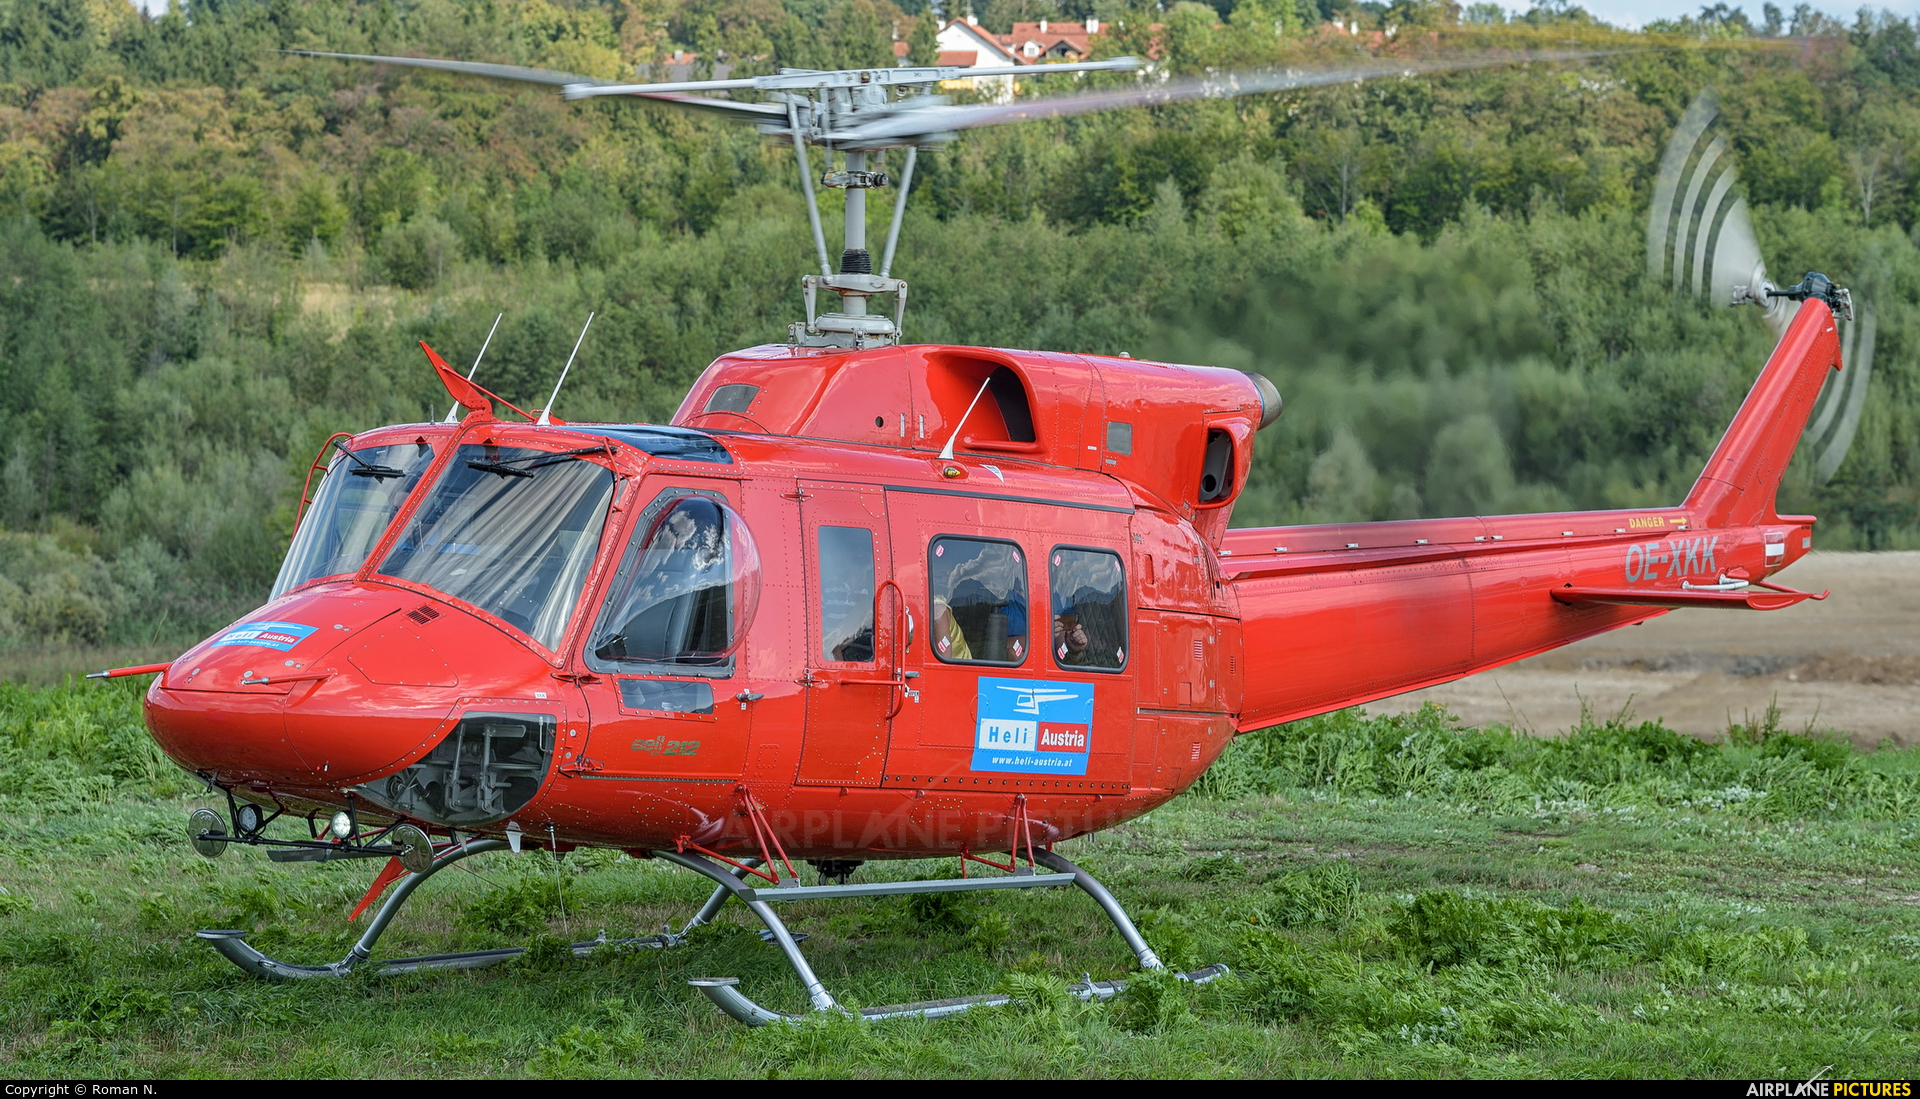 Heli Austria OE-XKK aircraft at Off Airport - Austria